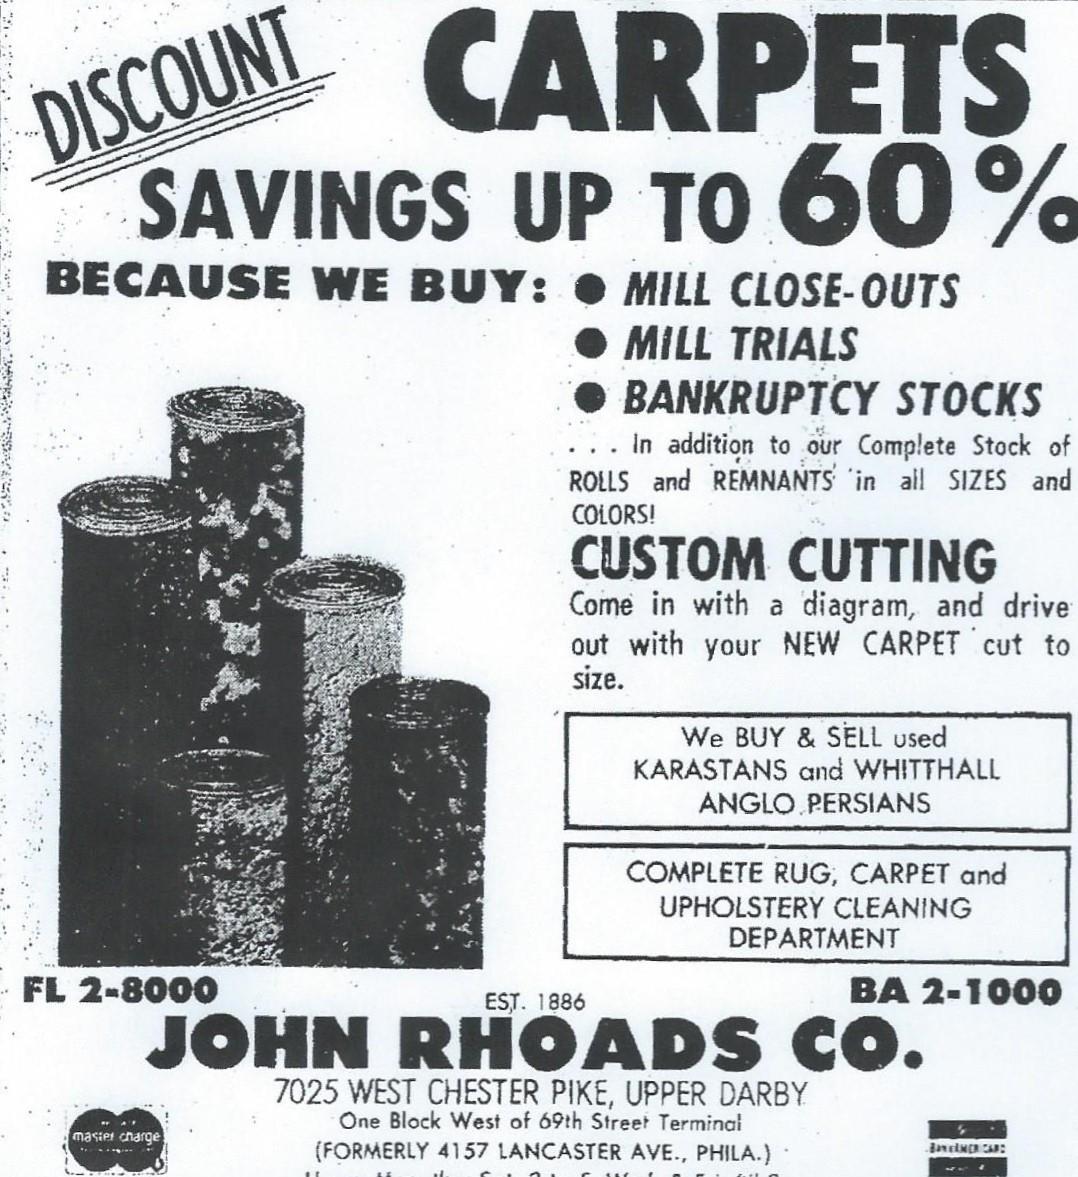 John Roads Co. advertisement